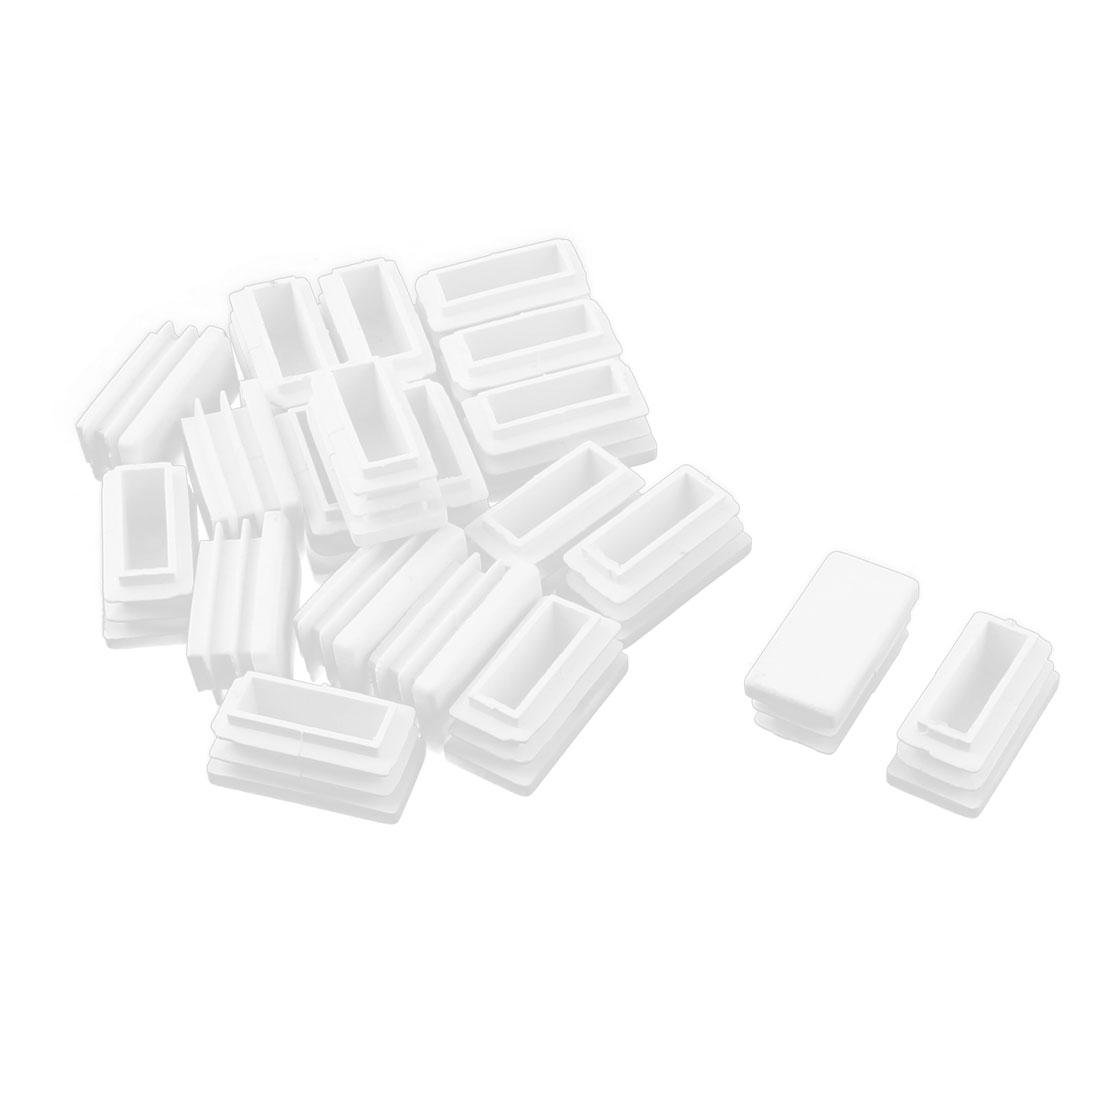 Table Chair Leg Feet Plastic Tube Pipe Insert End Cap White 1.4cm x 2.9cm 20pcs